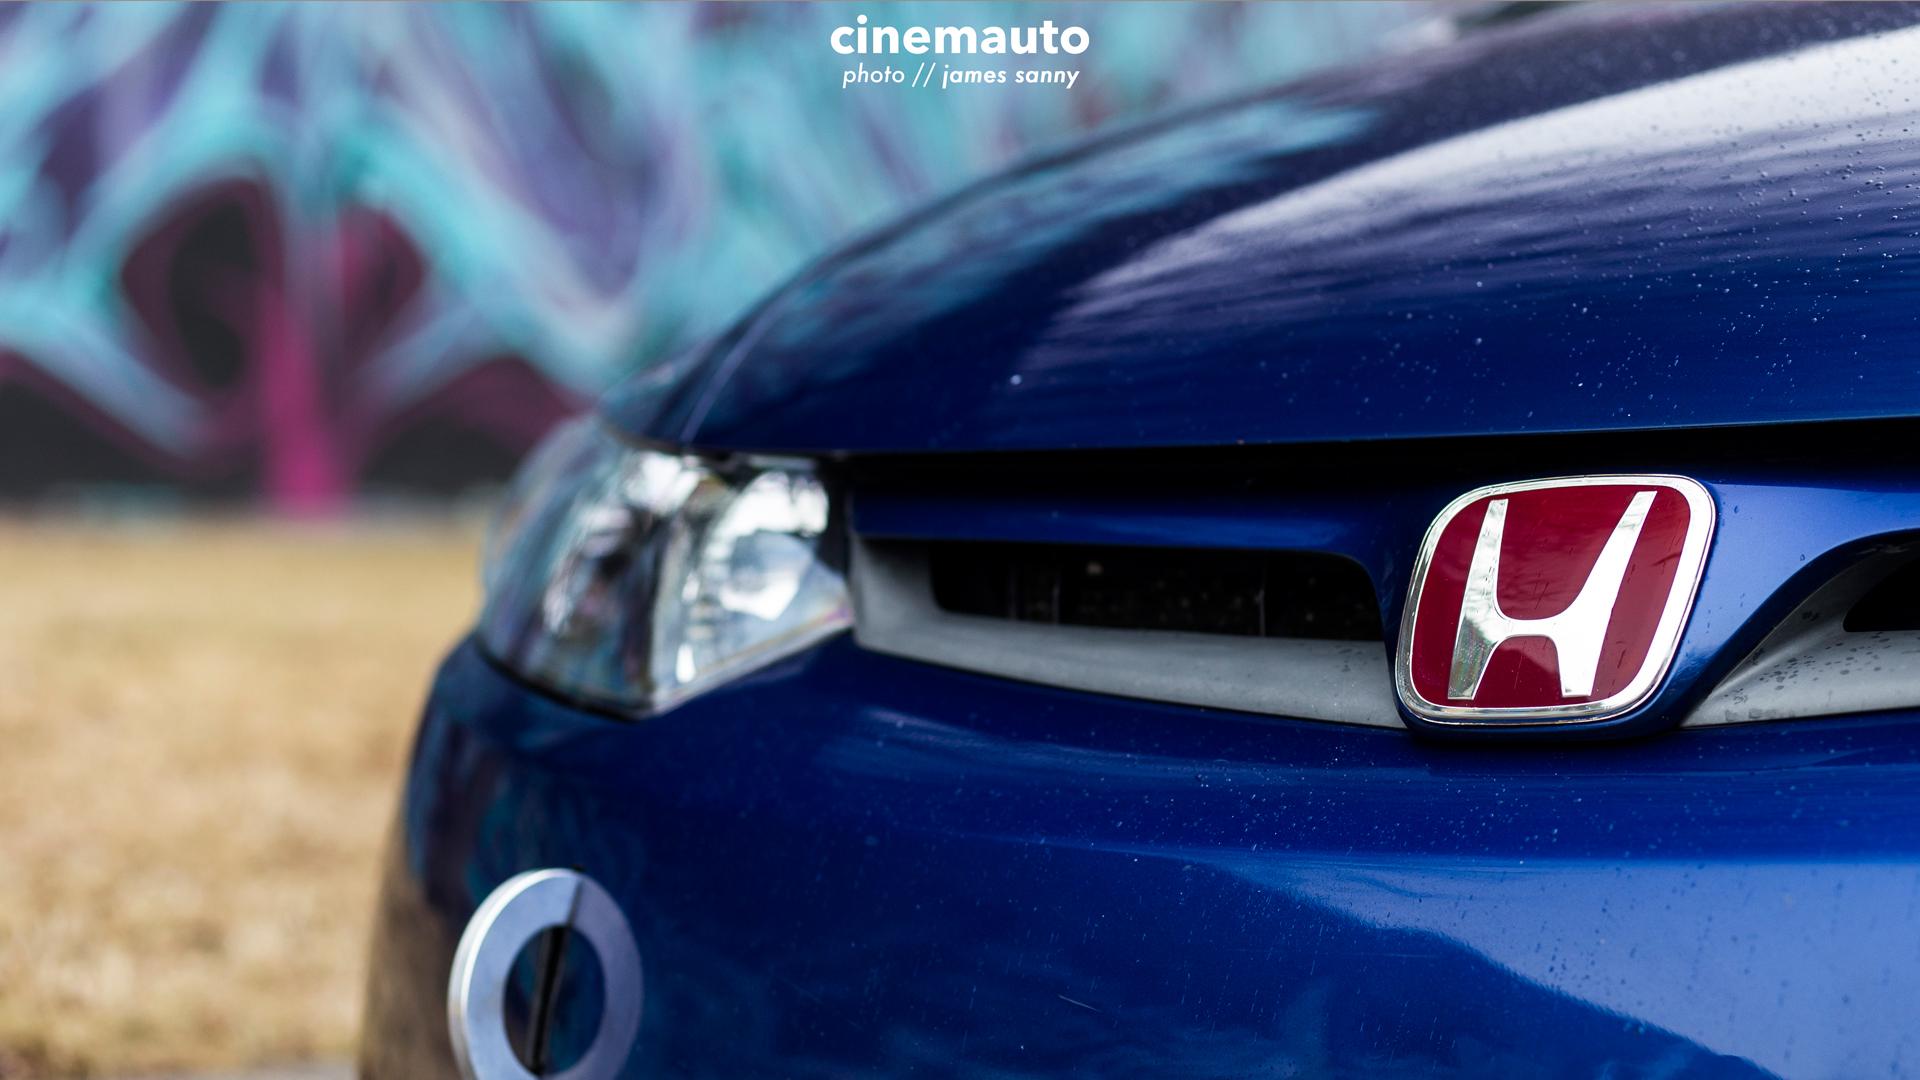 wichita-automotive-photographer-james-sanny-cinemauto-km3.jpg